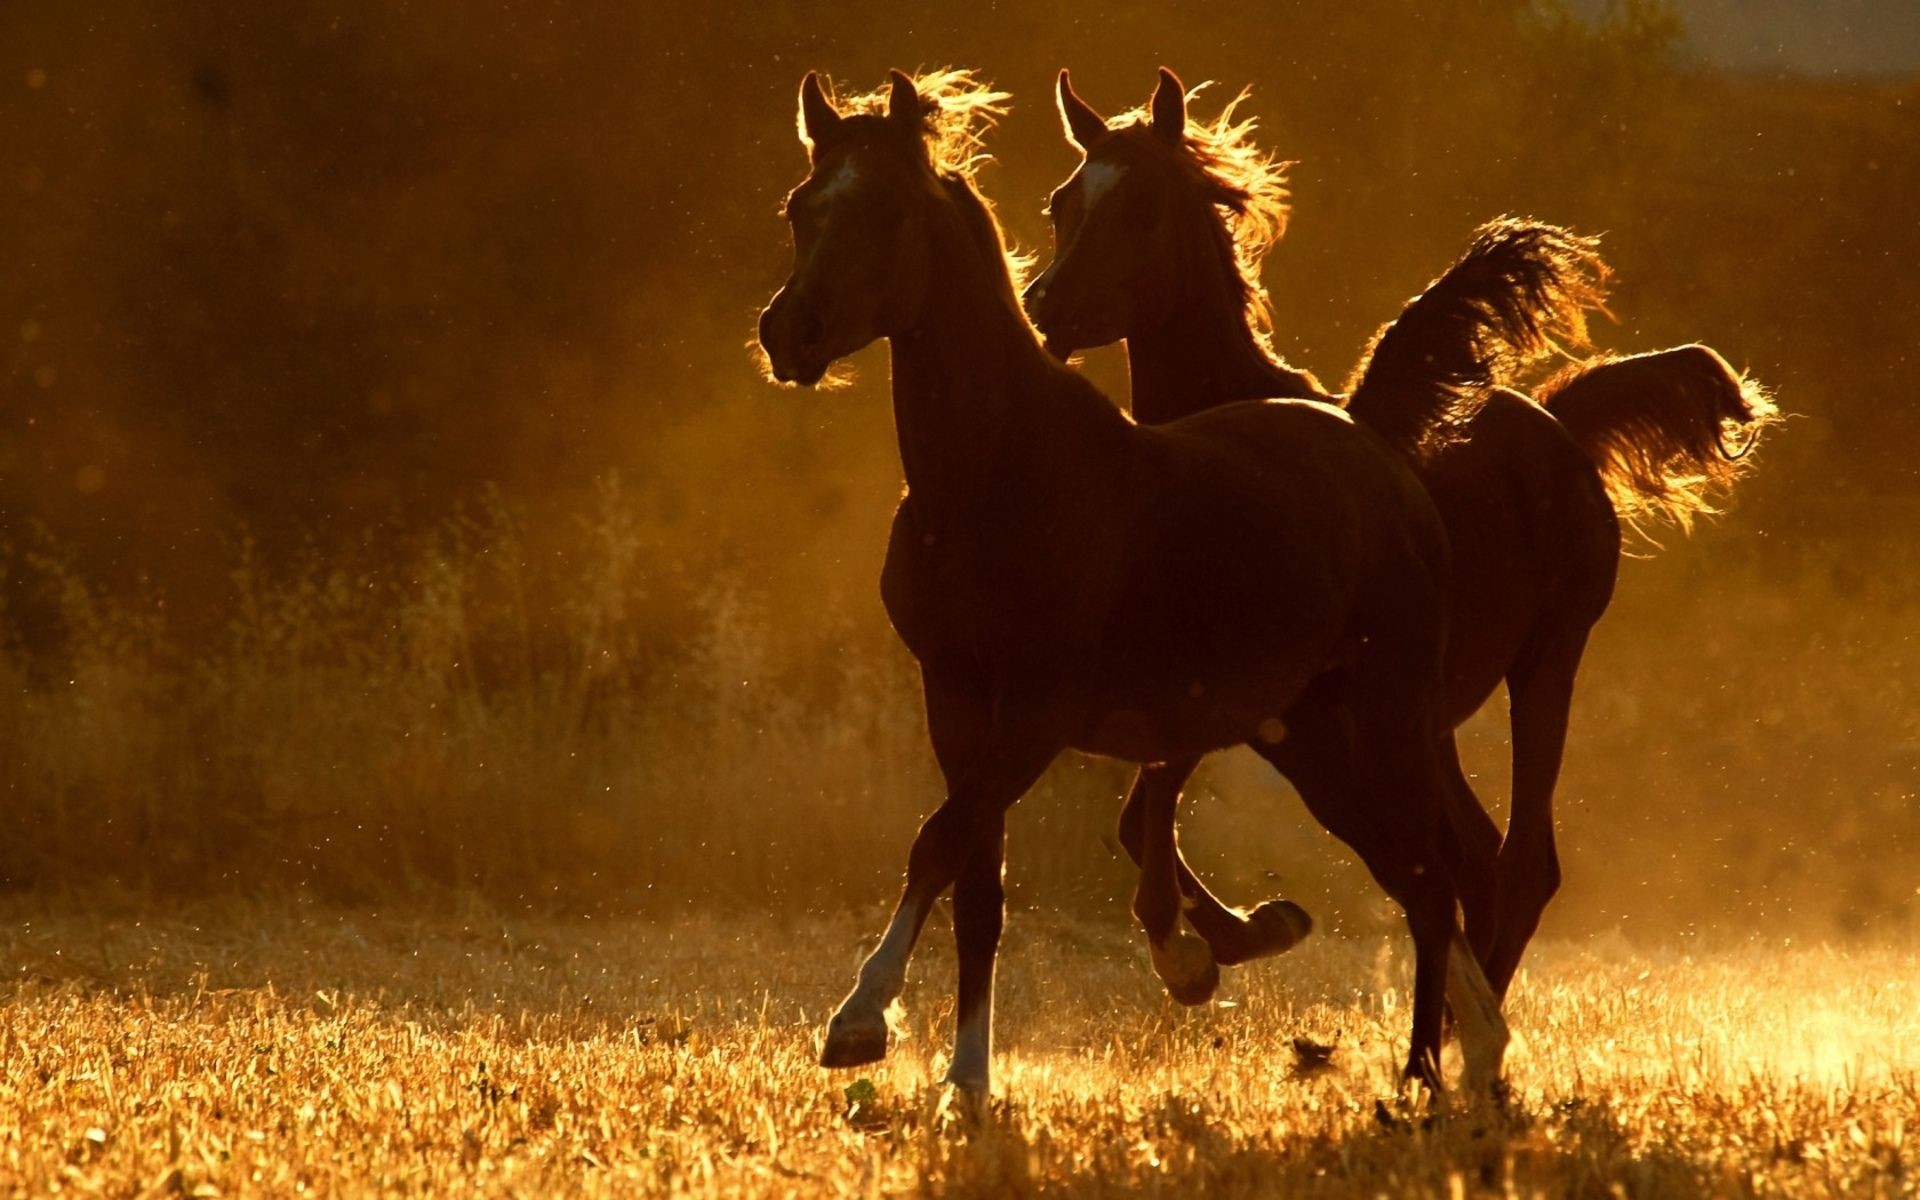 Horse Farm HD Wallpaper, Horse Farm Desktop Backgrounds